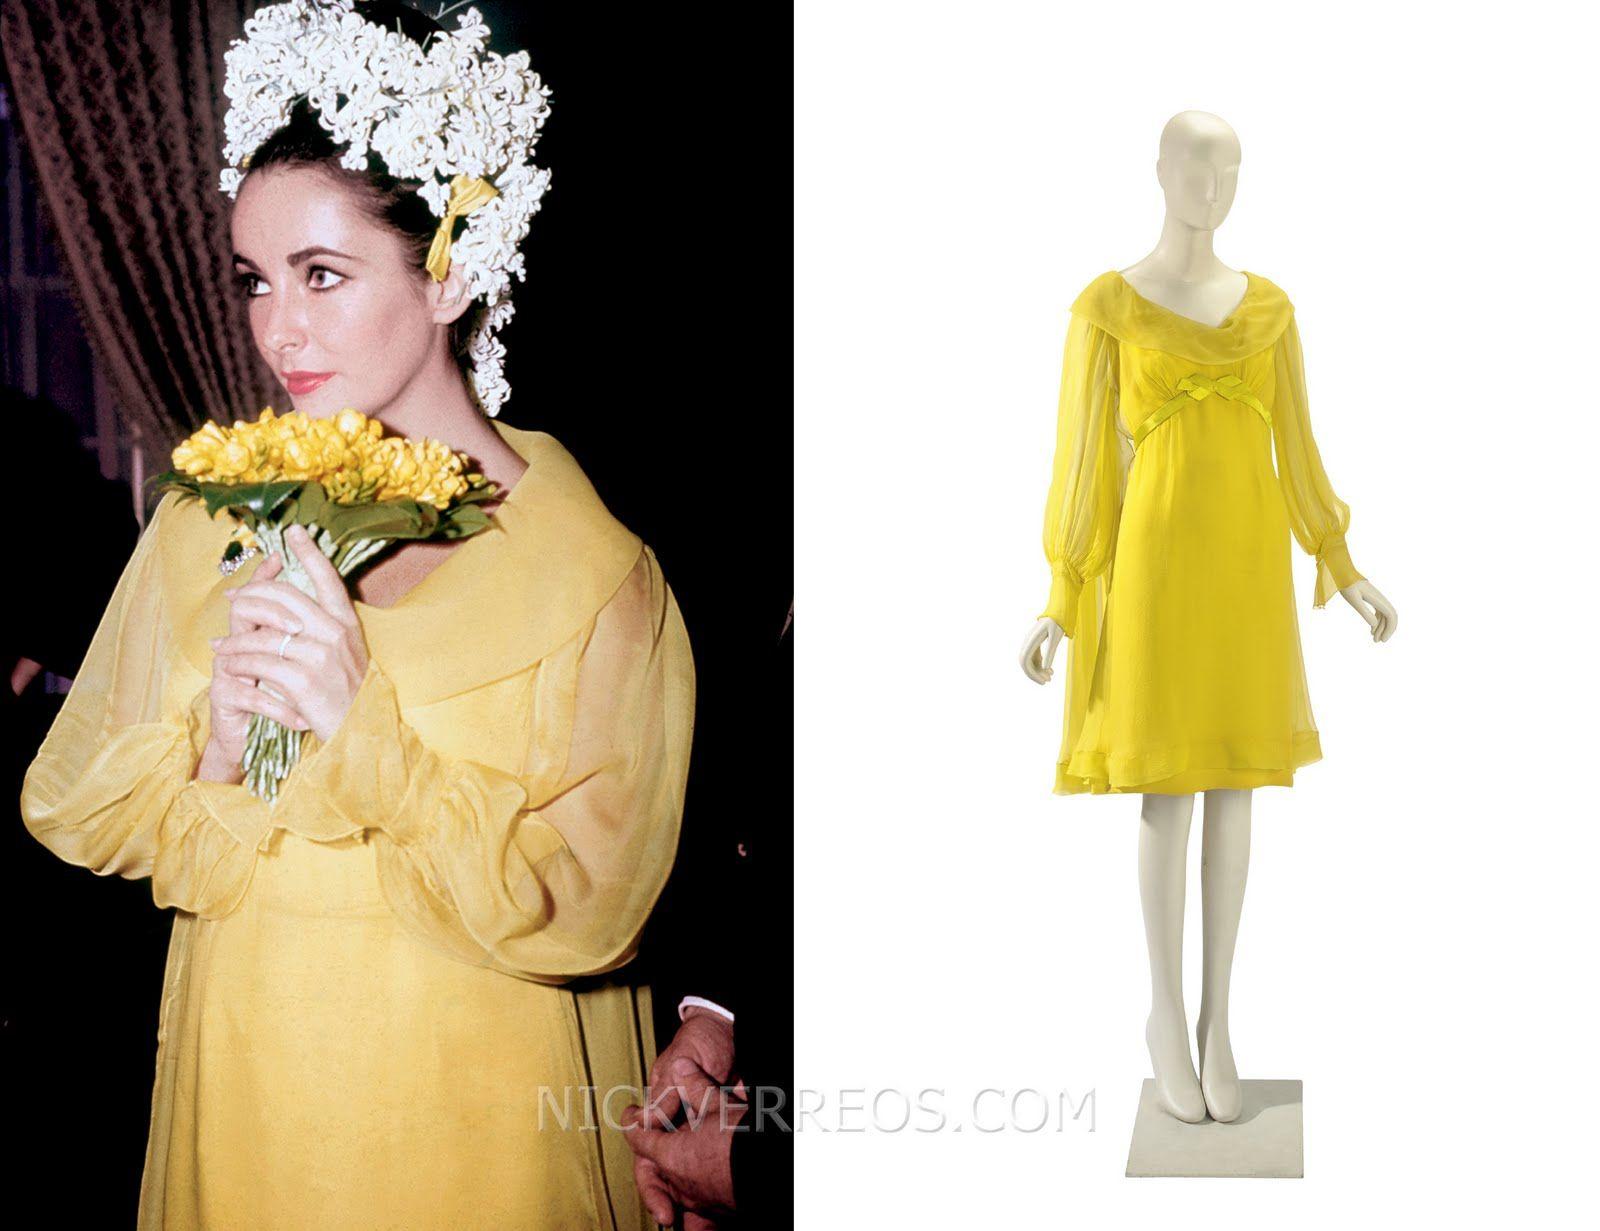 Sunflower Yellow Chiffon Wedding Dress: Designed By Hollywood Costume  Designer Irene Sharaff  Who Designed Her